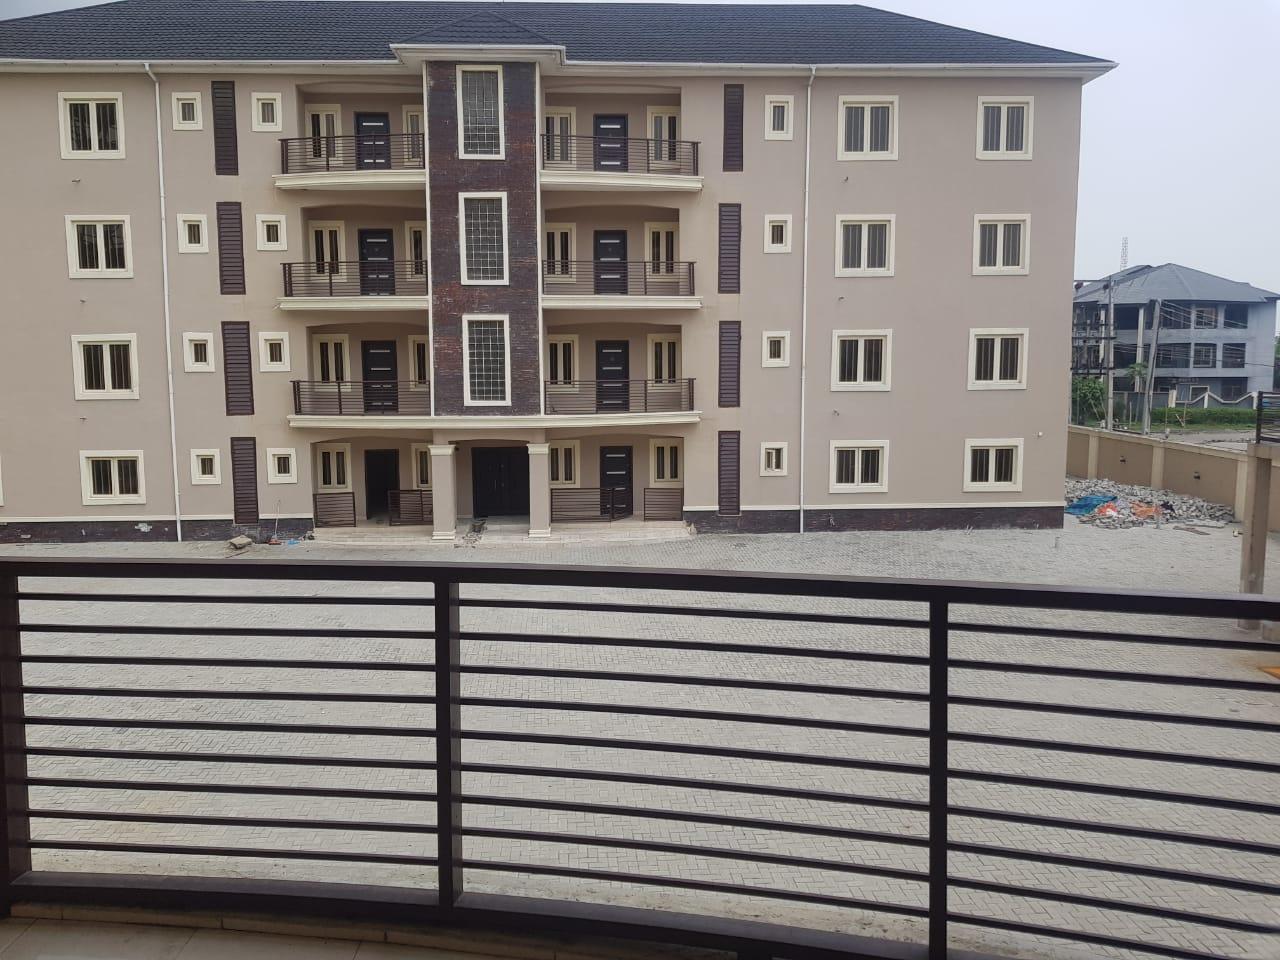 3 bedroom flat for rent in lekki lagos-nigeria-property-finder (13)